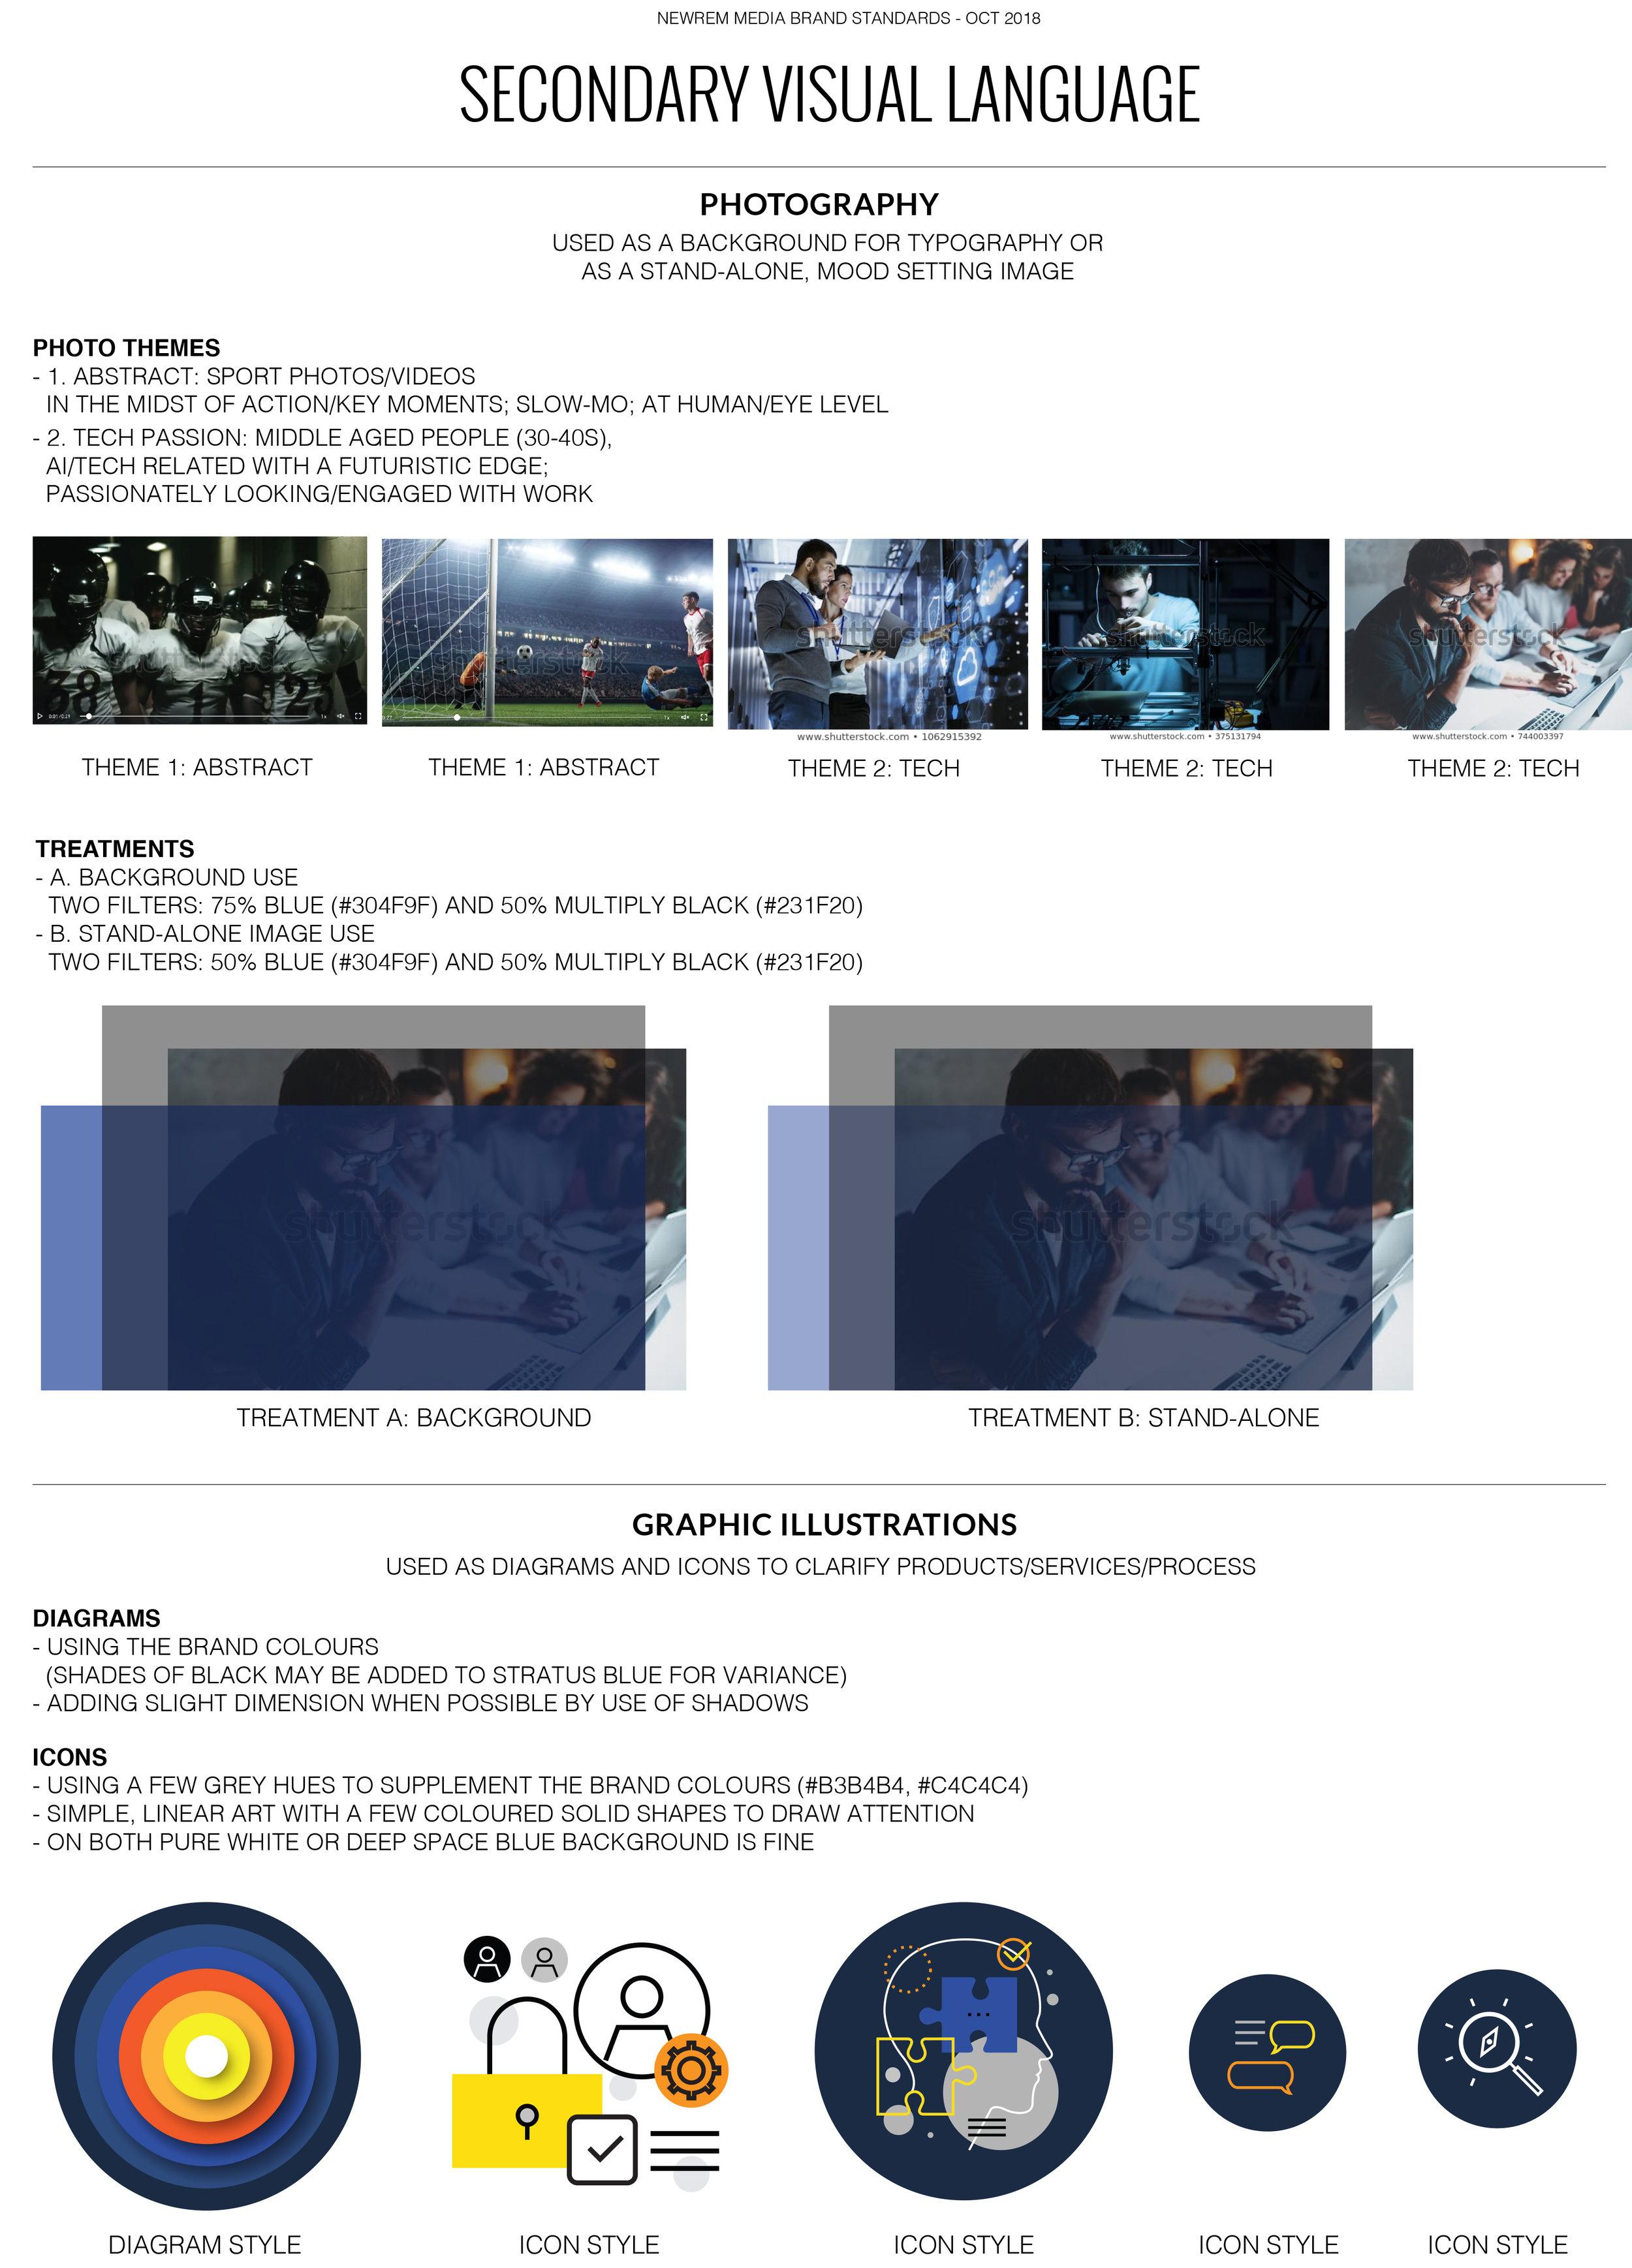 NewRemMedia FullBrandStandards-2.jpg